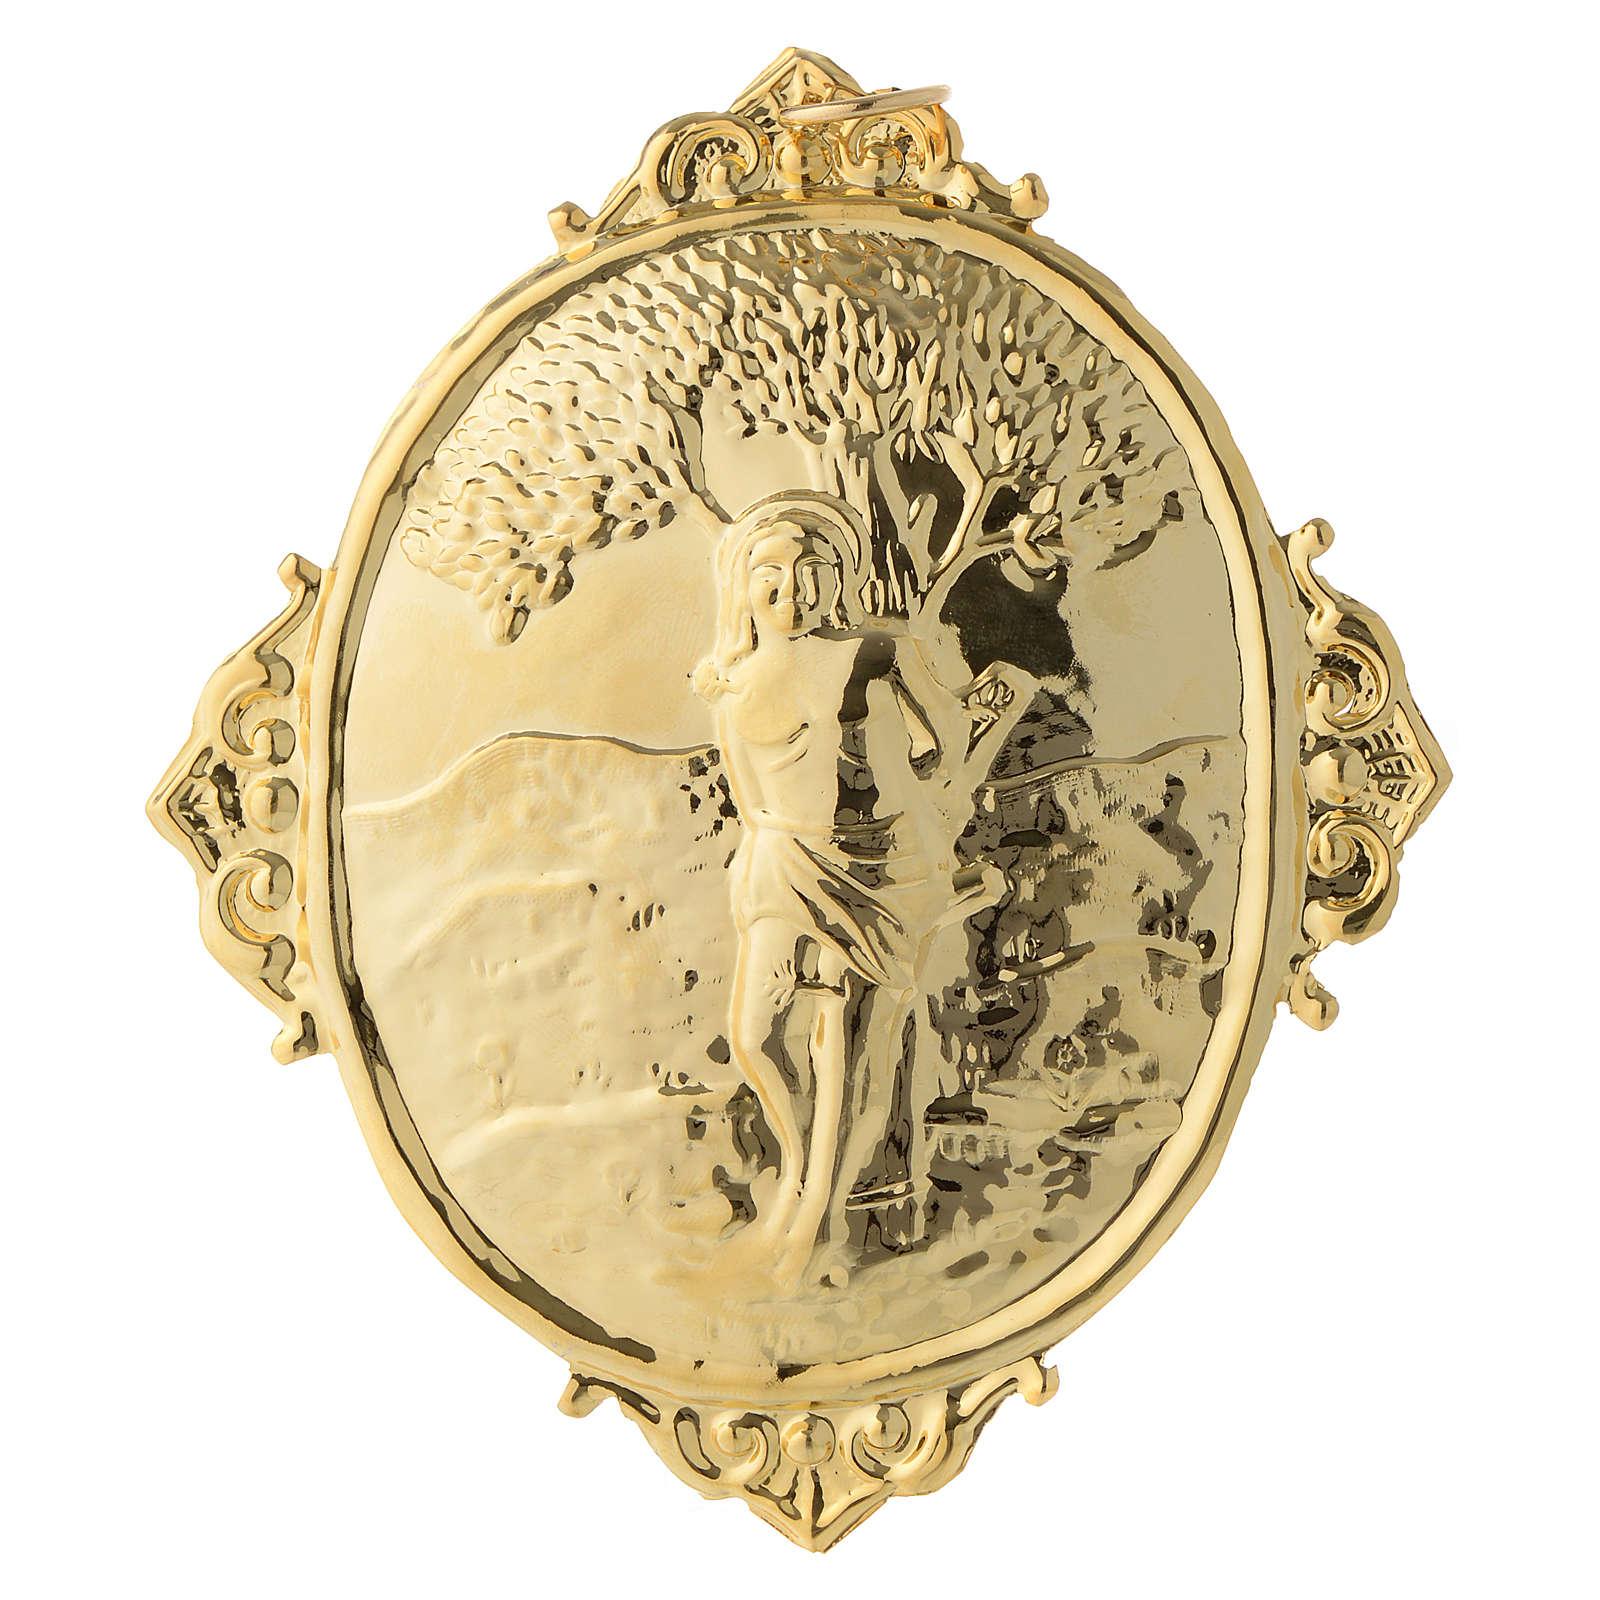 Confraternity Medal in metal, Saint Sebastian 3